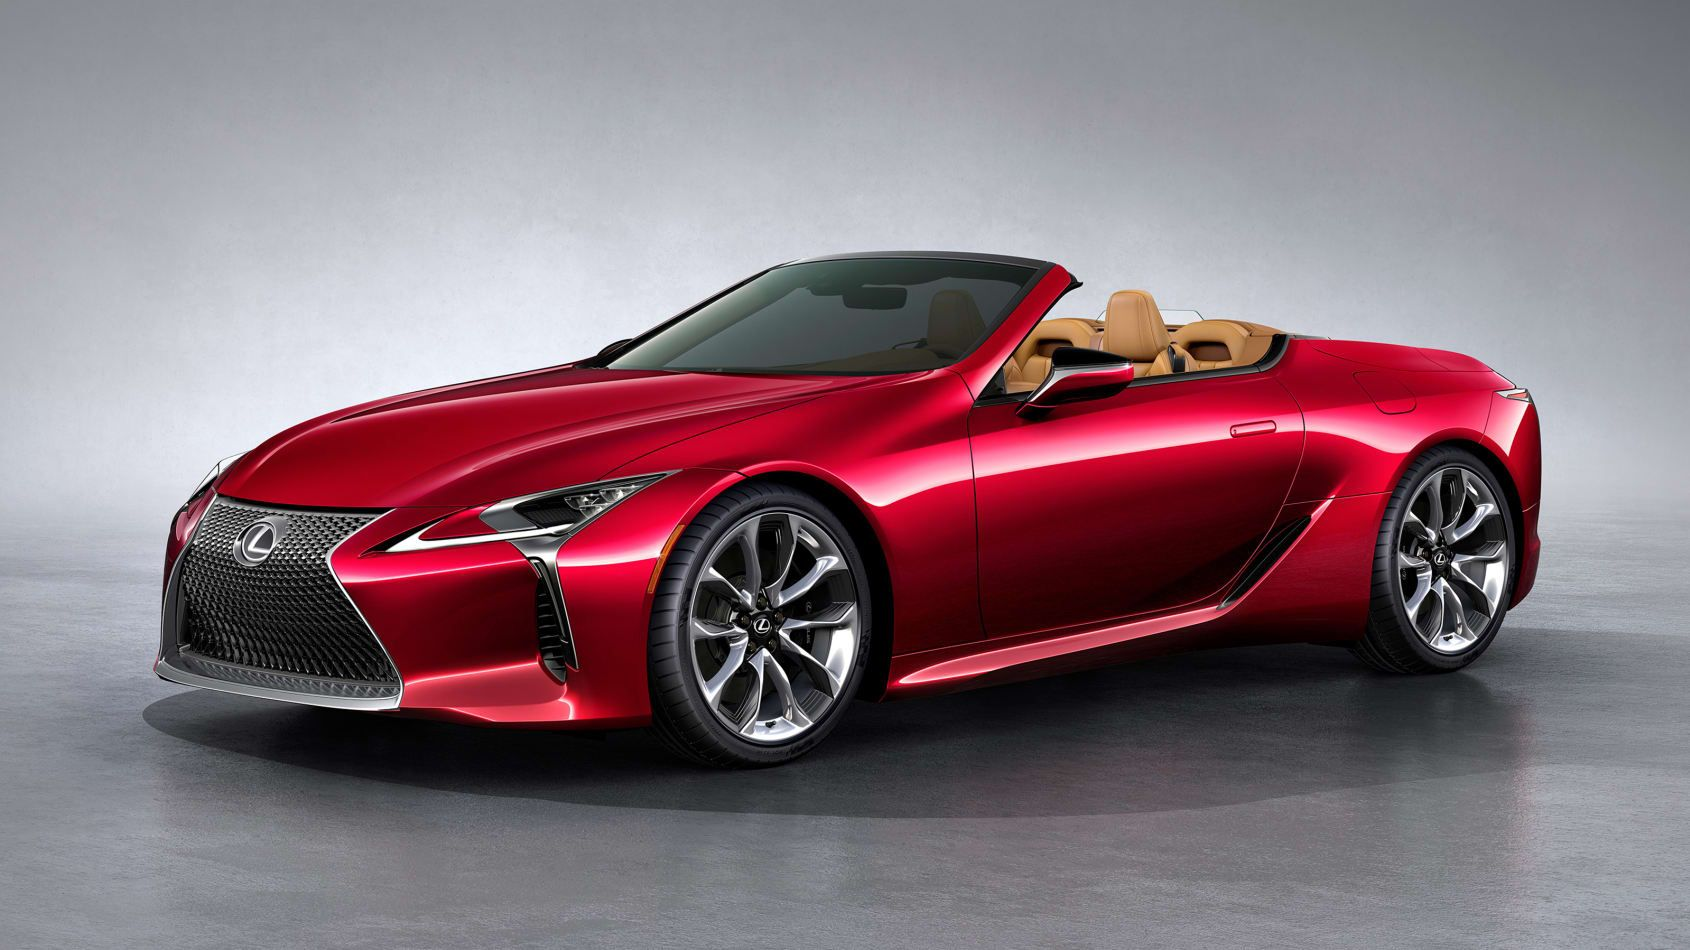 Lc 500 Lexus 2021 Redesign In 2020 Lexus Convertible Lexus Lc Lexus